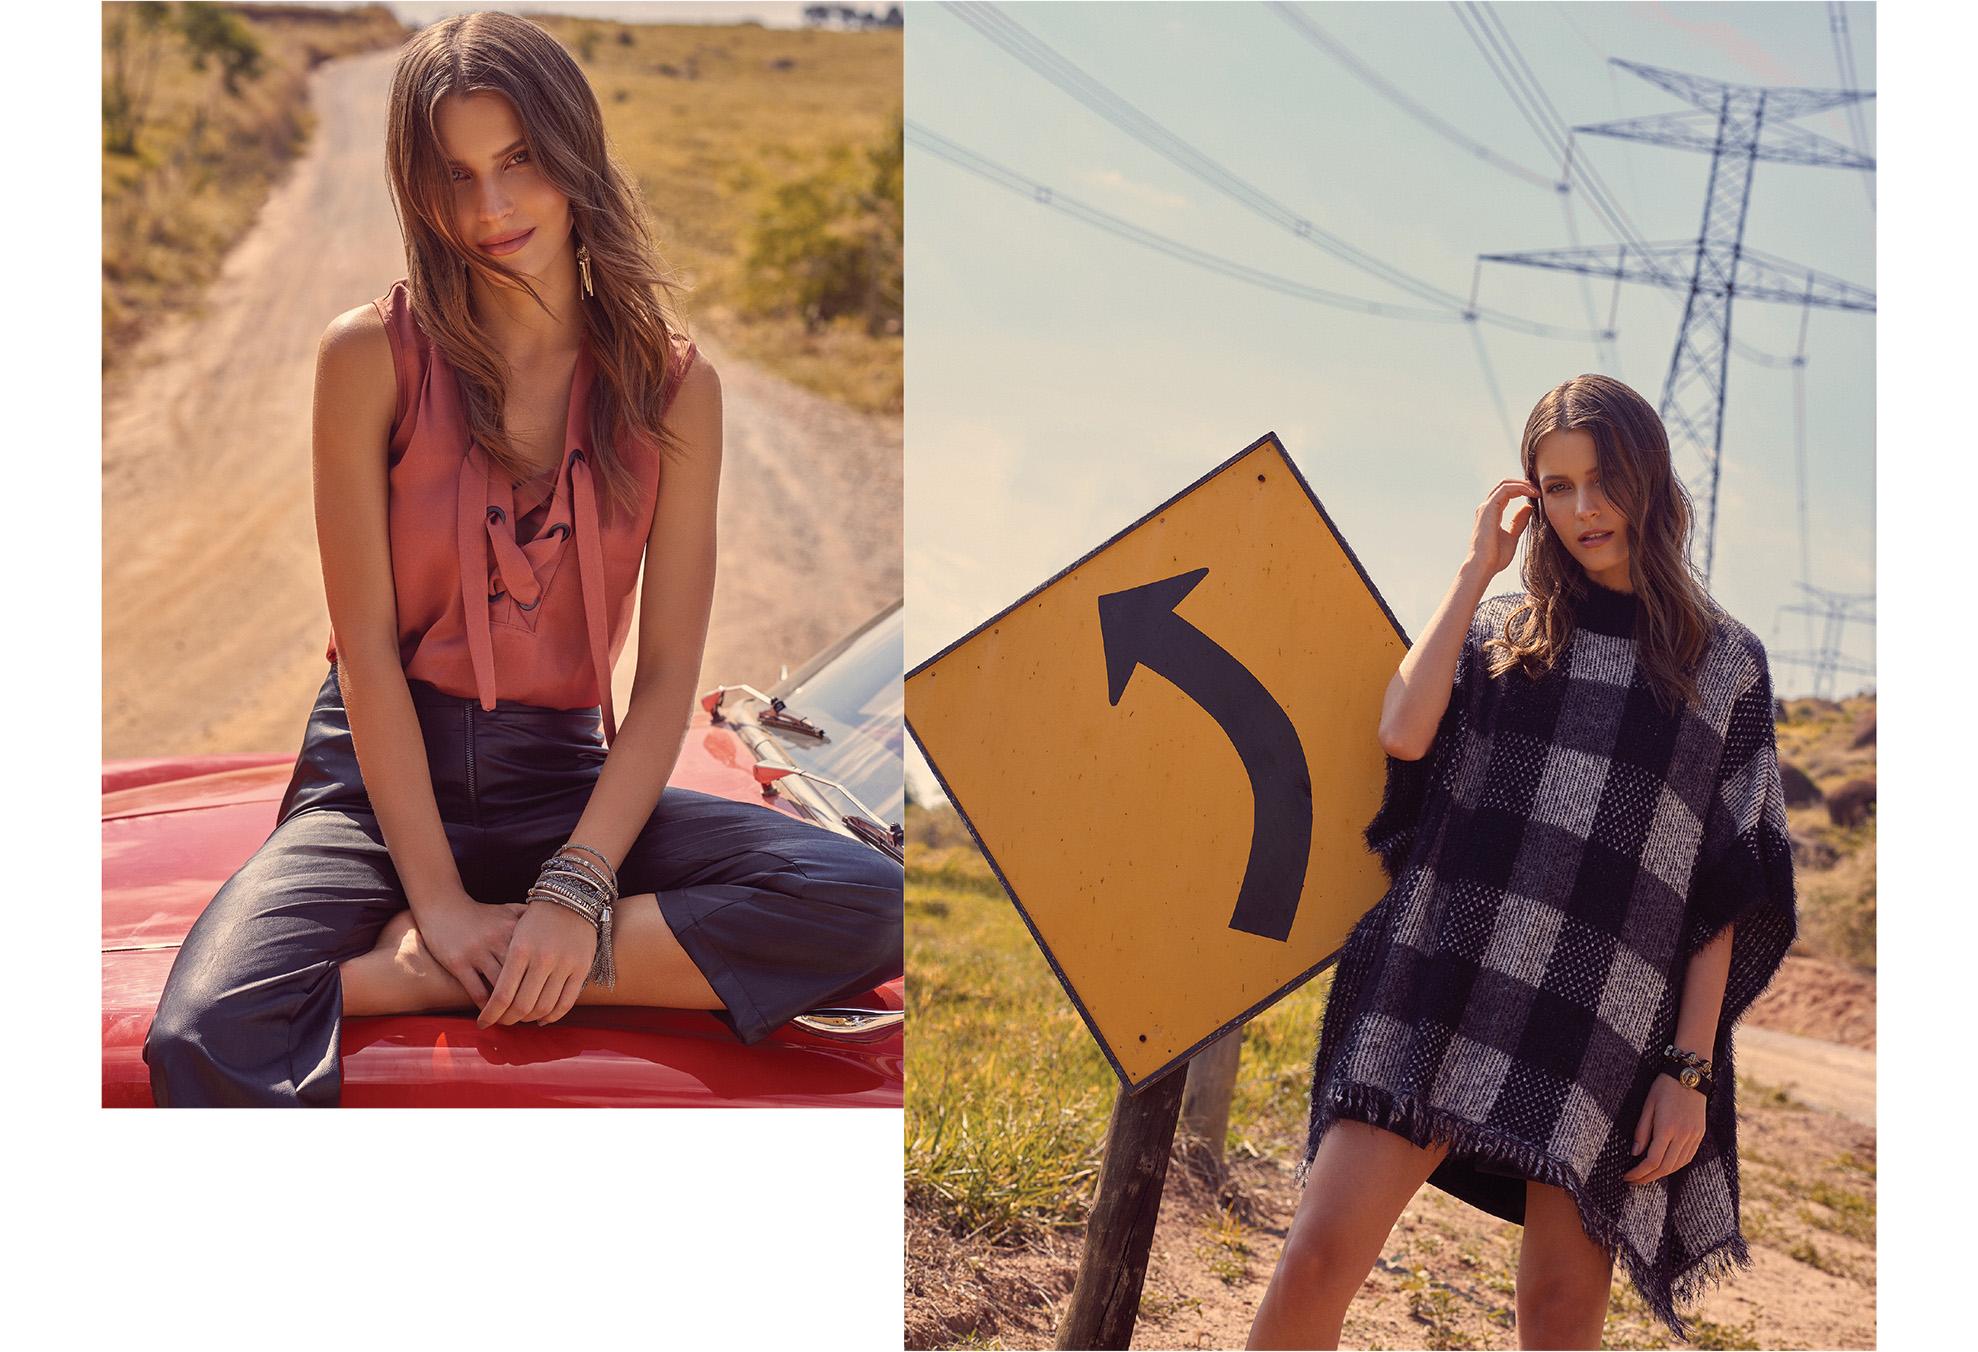 vf-road-02